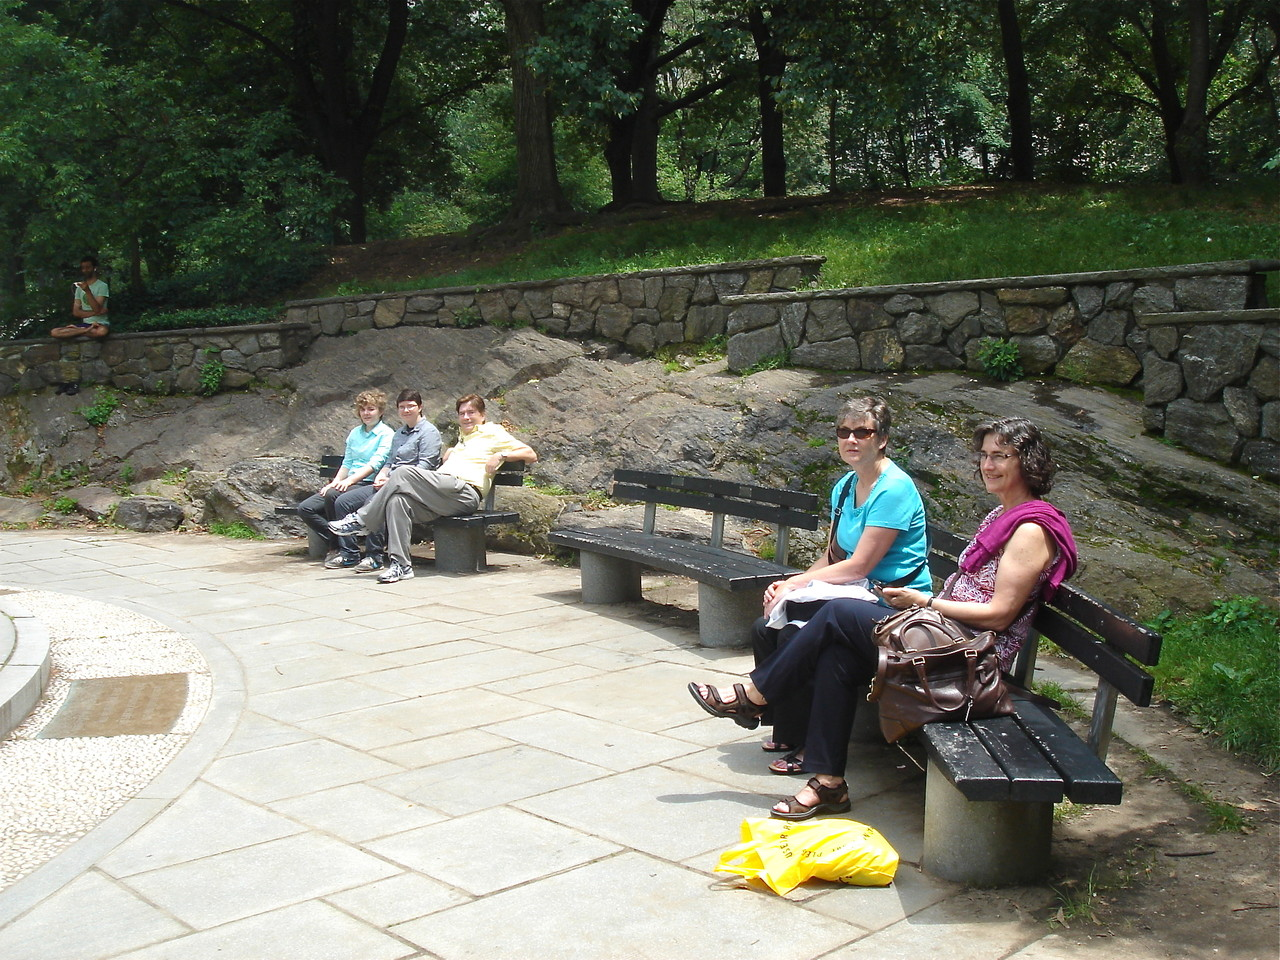 Central Park, June 6, 2013